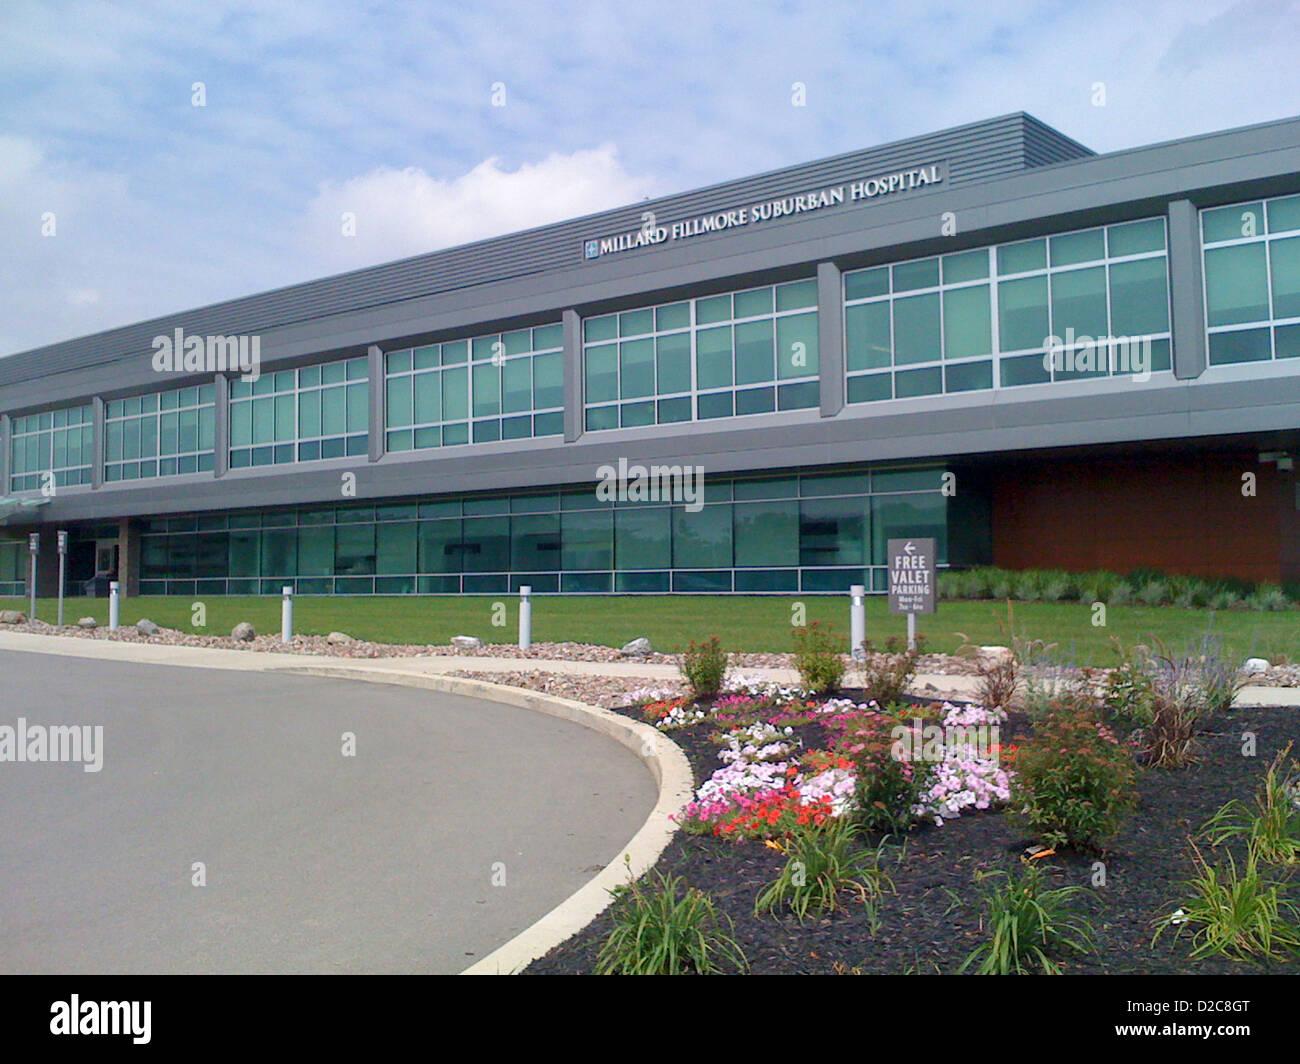 Millard Fillmore Suburban Hospital, Williamsville, New York - Stock Image